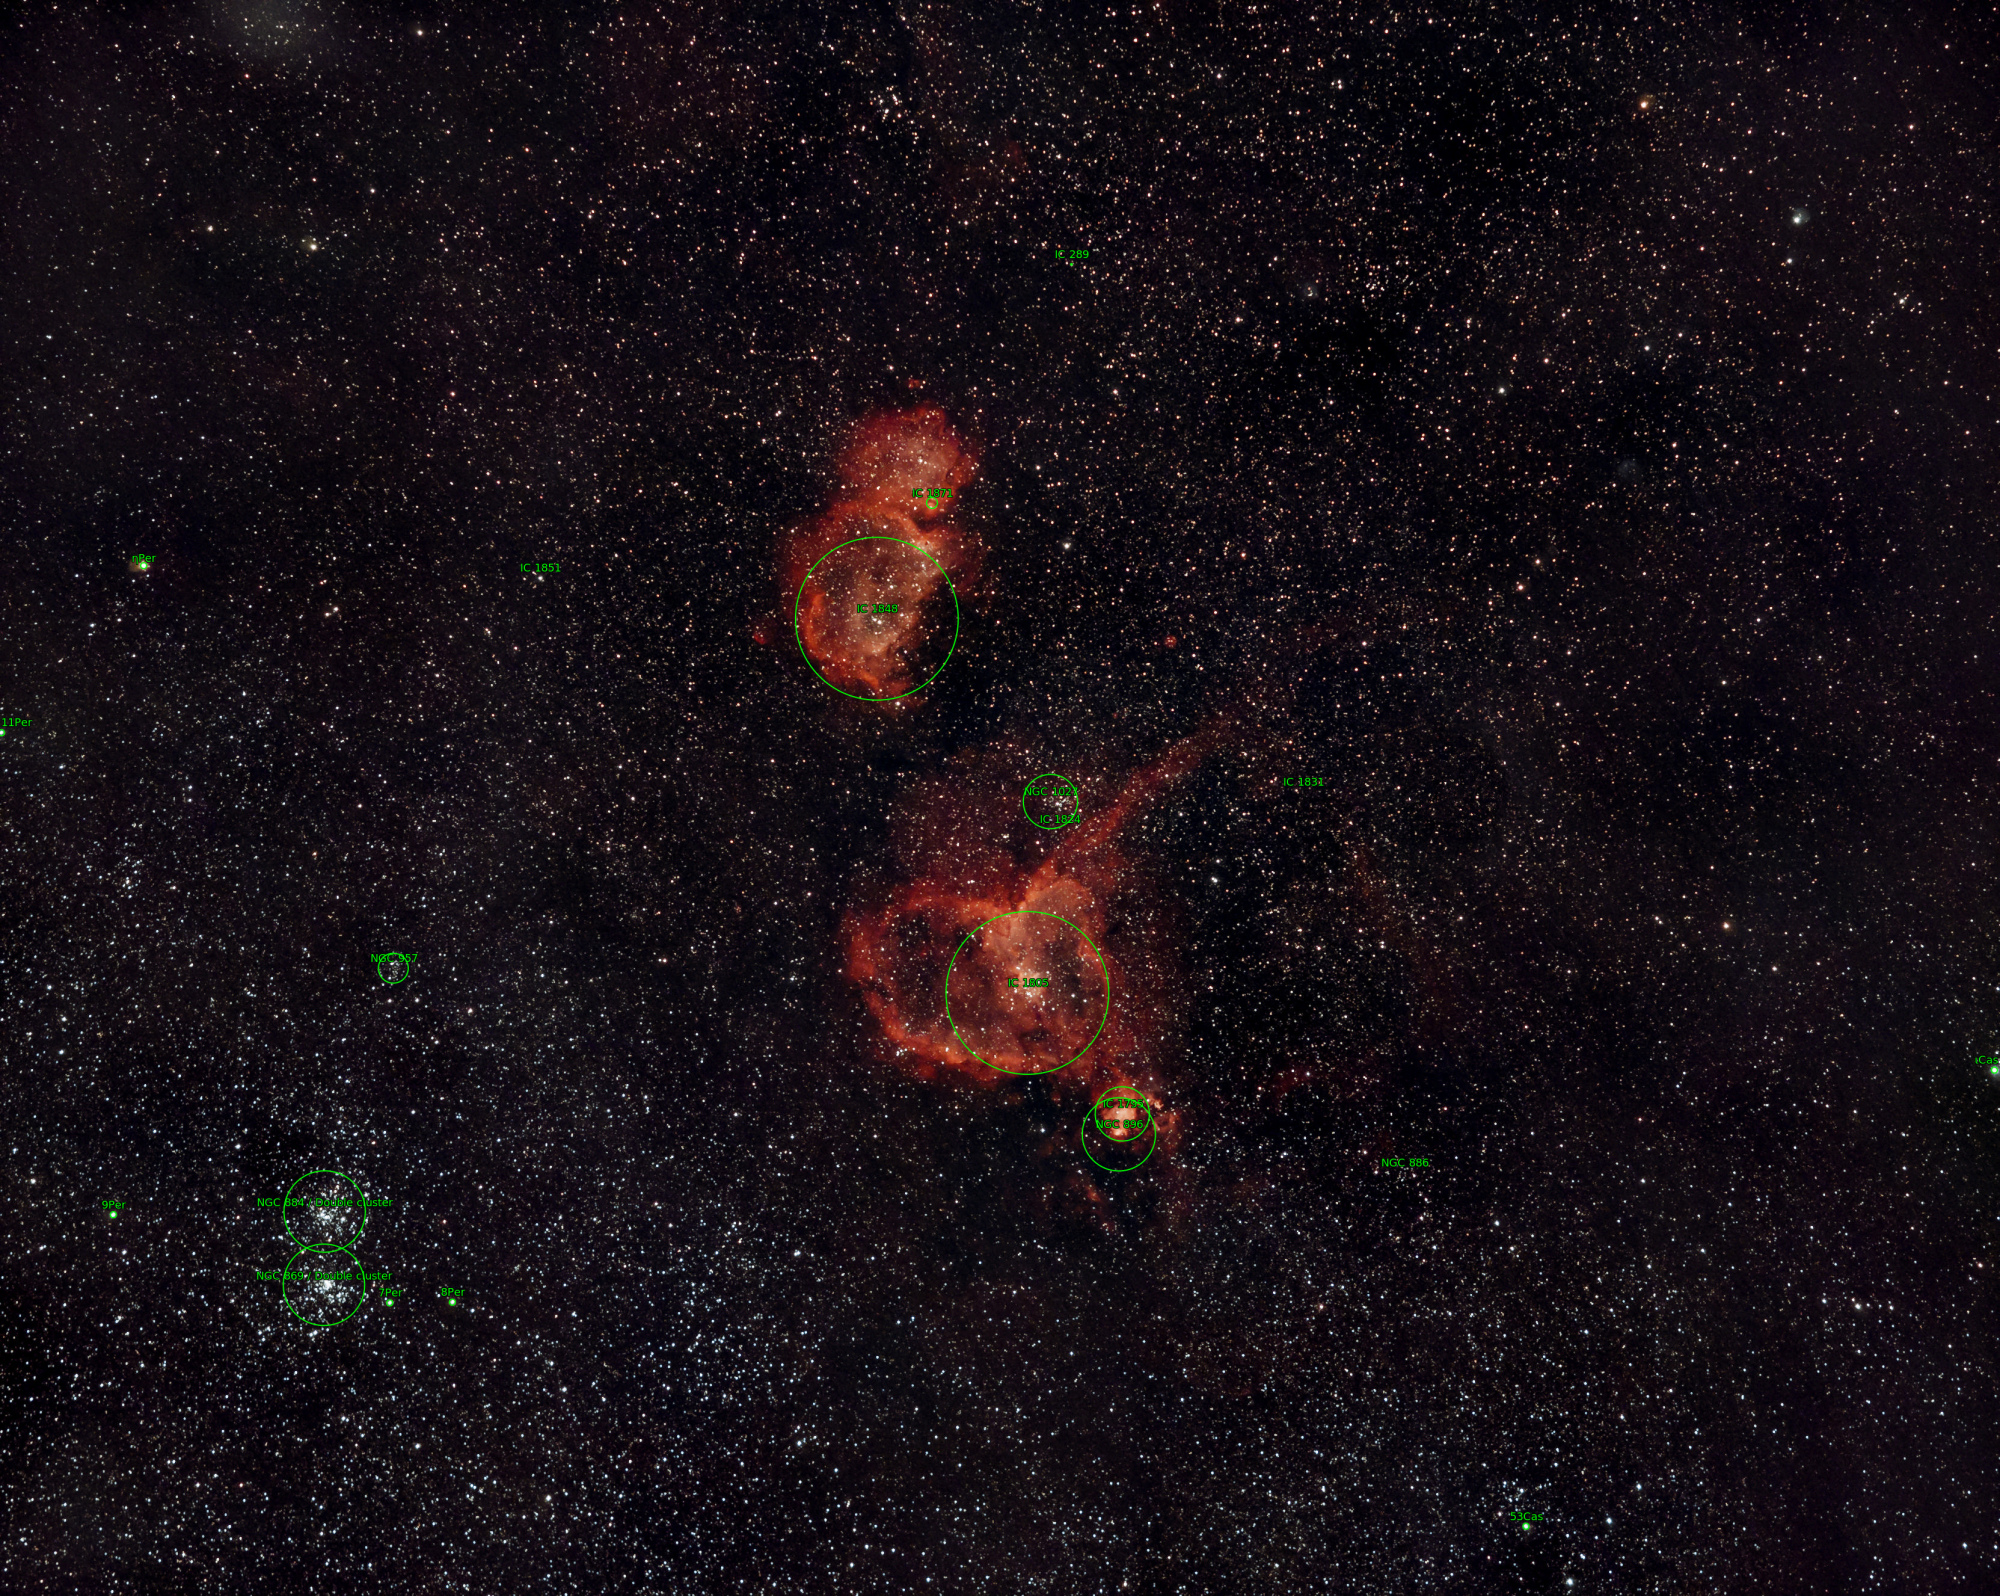 astrometryHEART135.thumb.jpg.e8f388b1767d5c20a915e09a2d23573e.jpg